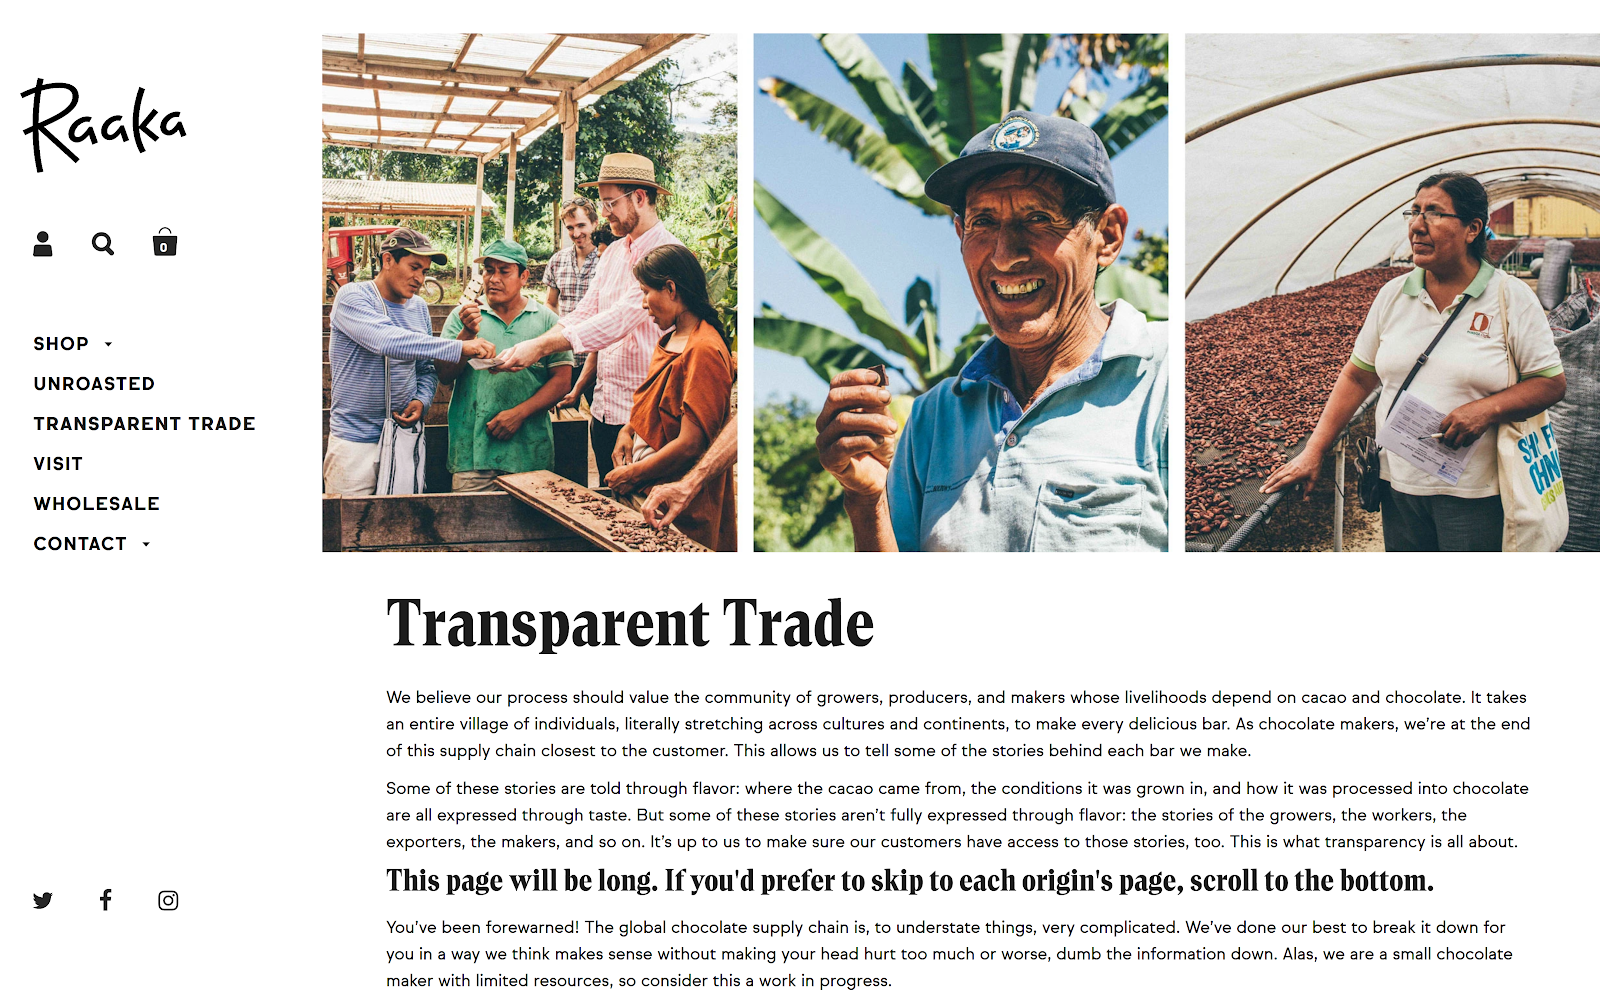 Raaka's Transparent Storytelling